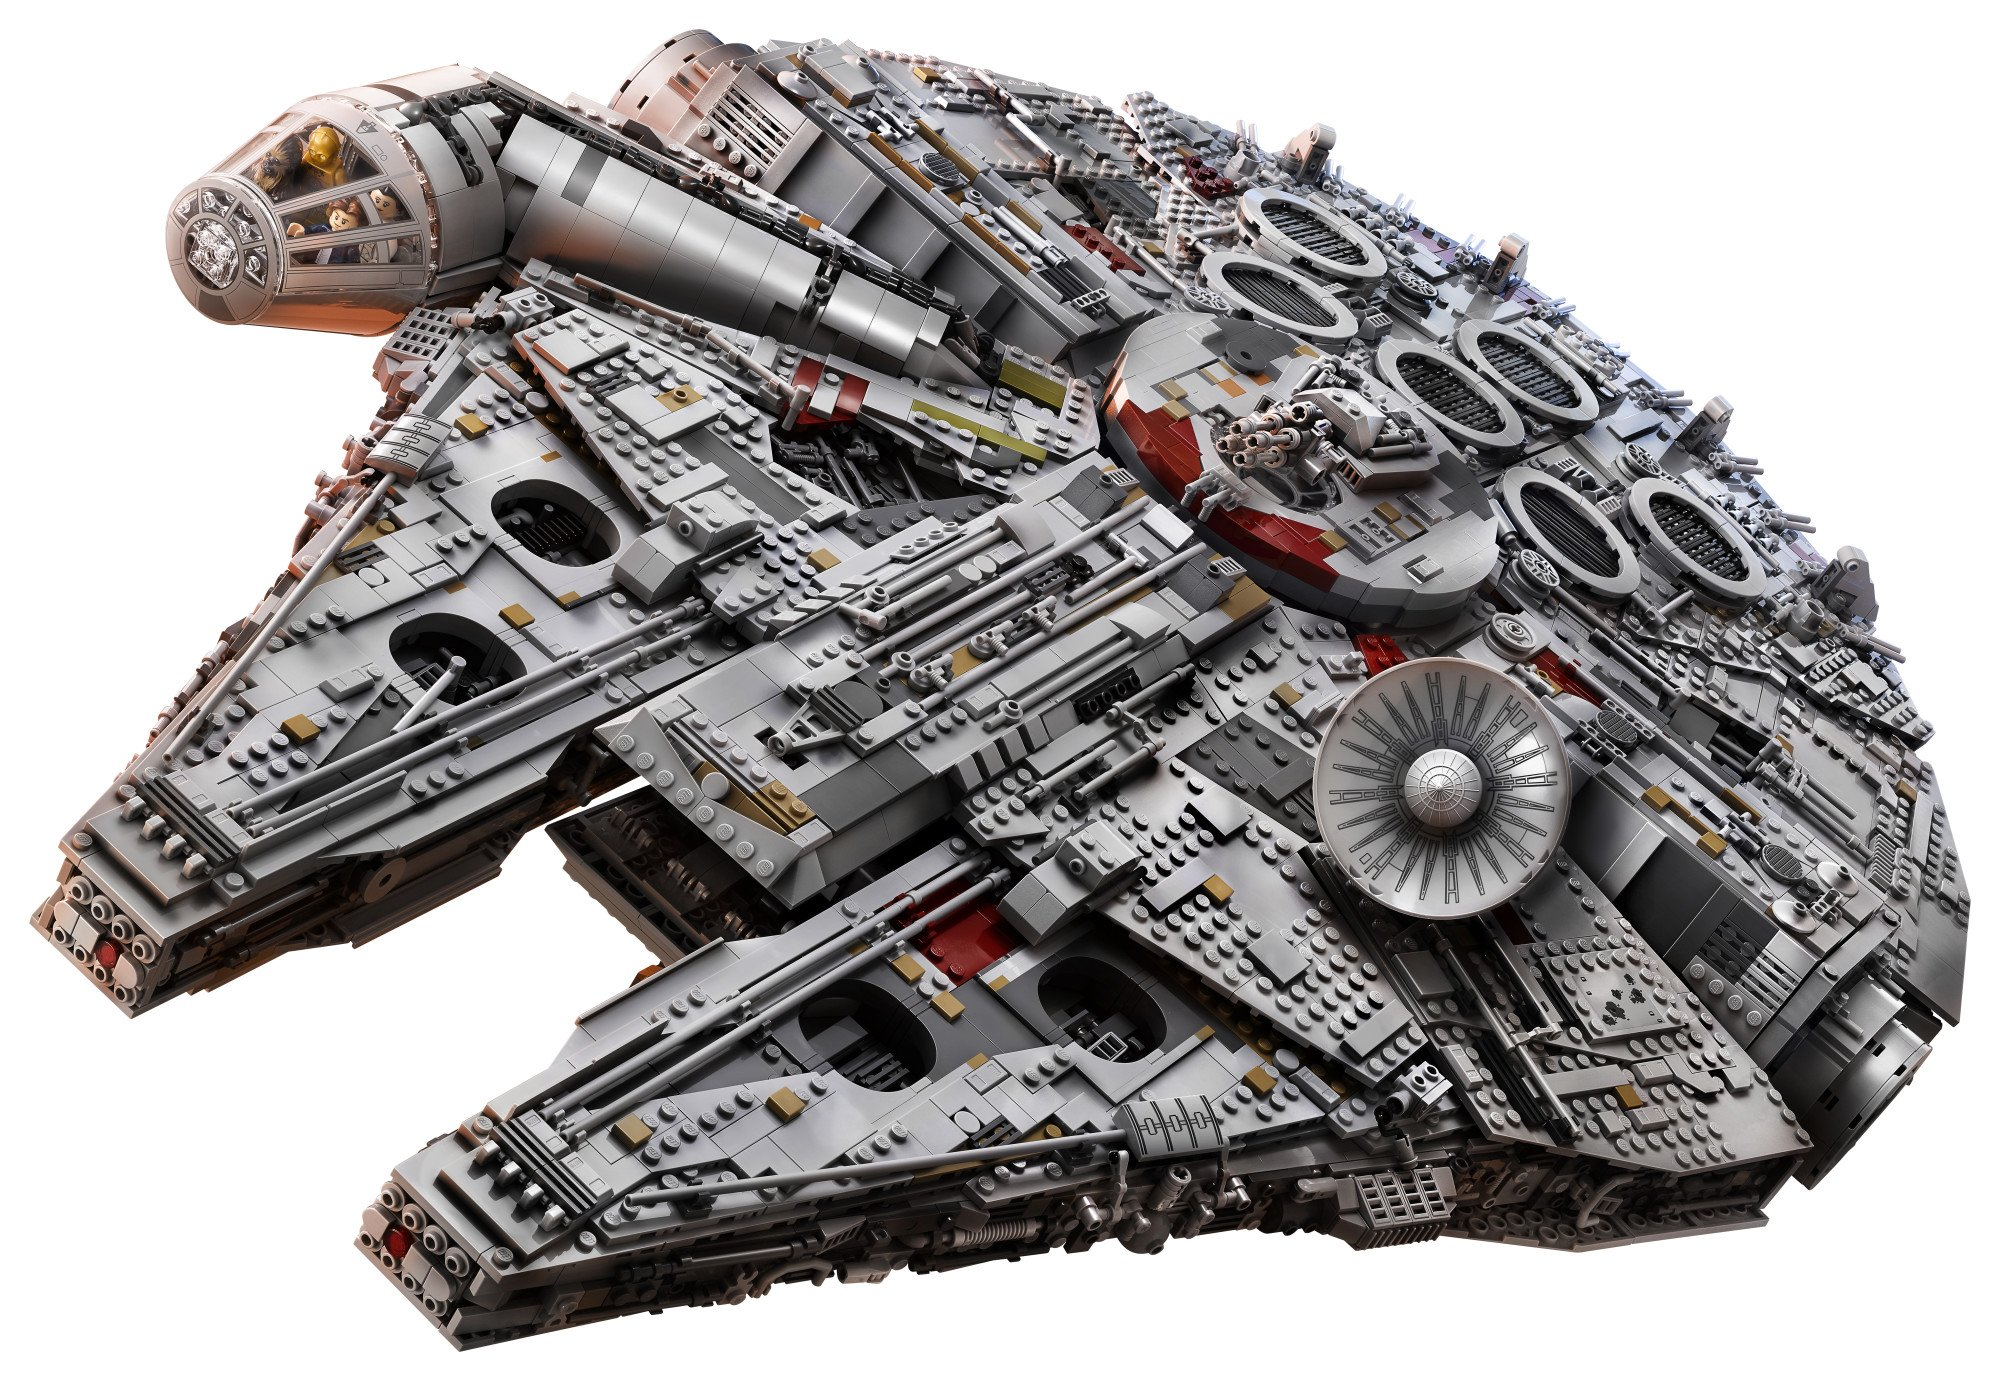 LEGO Star Wars Millennium Falcon 75192 Building Kit (7541 Piece) by LEGO (Image #2)